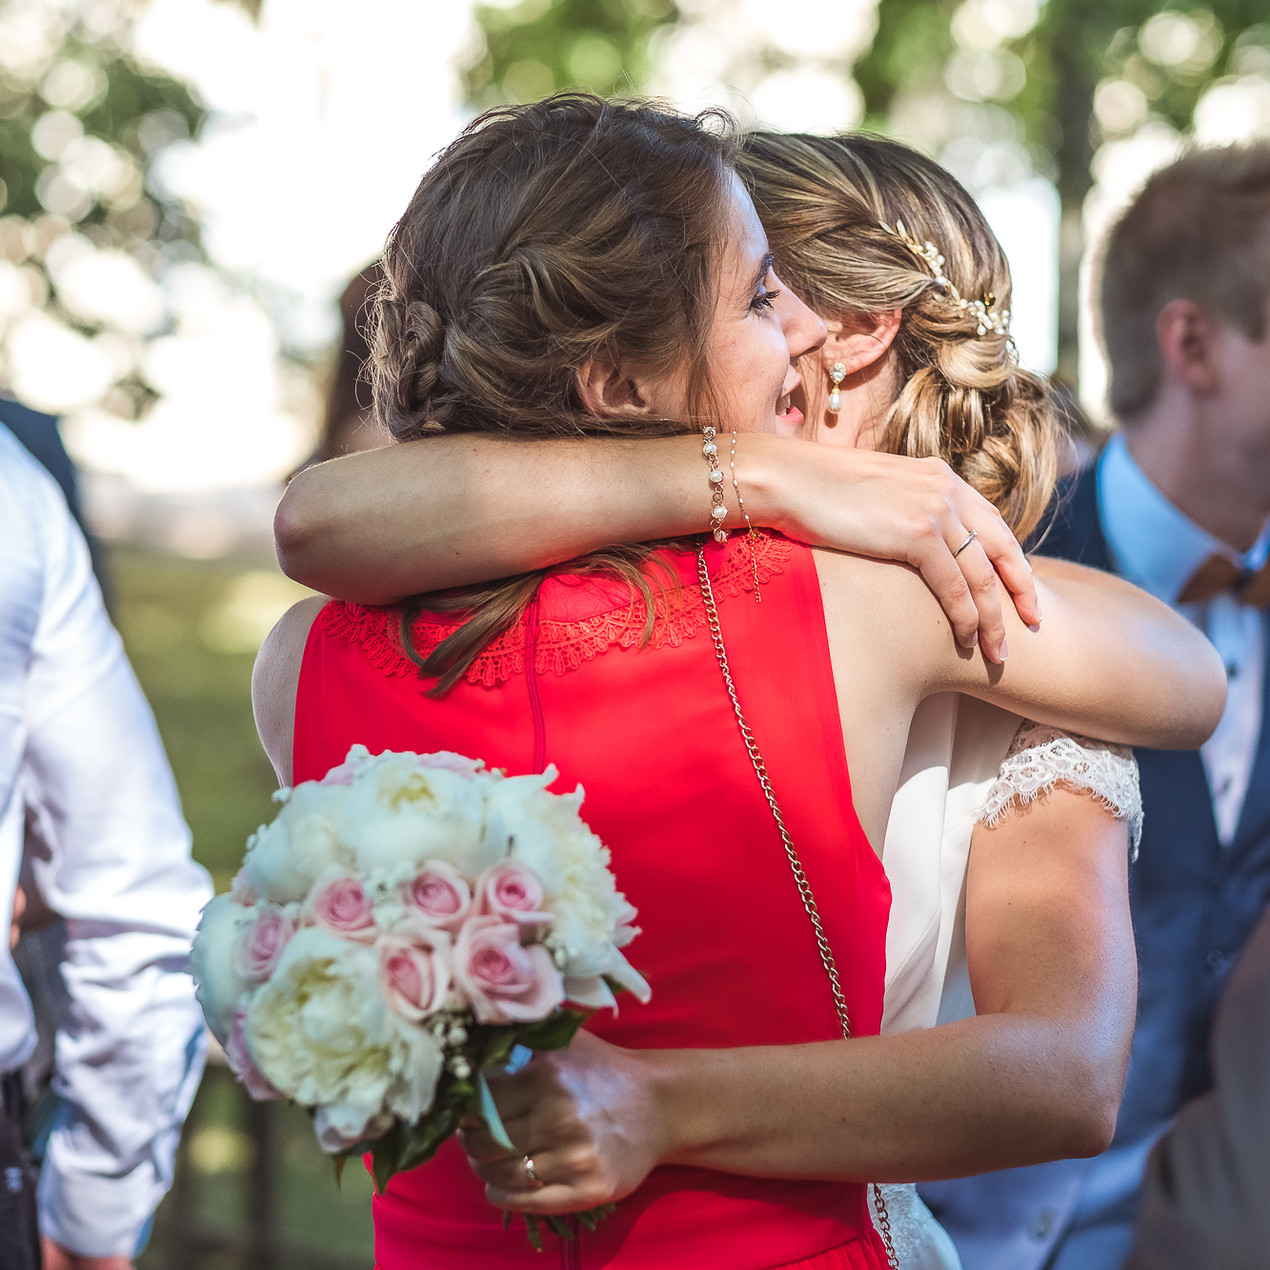 reportage mariage - anne bied - photographe mariage bourgogne - photographe mariage saone et loire - photographe mariage cote dor